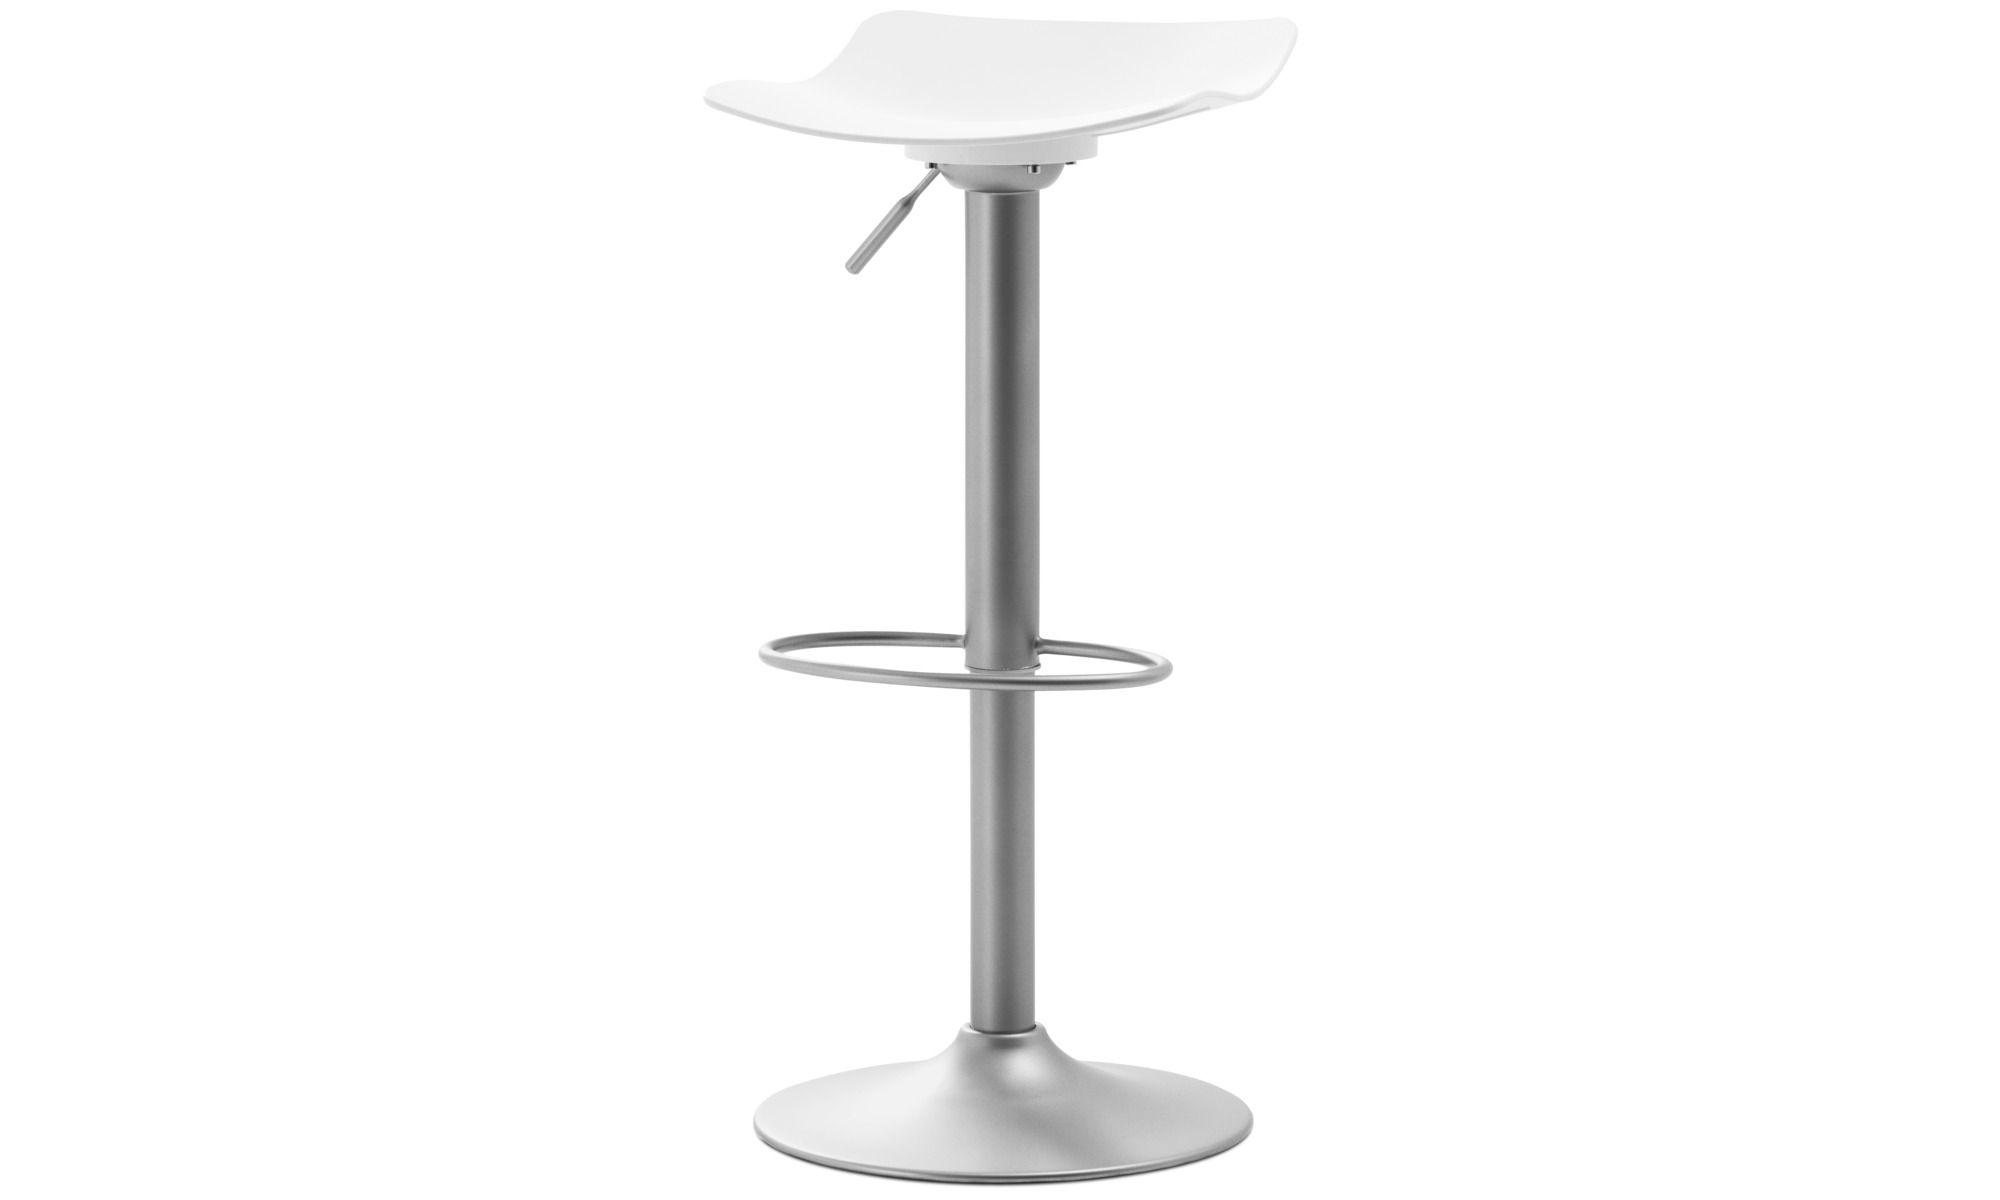 Fantastic Barstools Torup Barstool With Gas Bar Stools Bar Andrewgaddart Wooden Chair Designs For Living Room Andrewgaddartcom